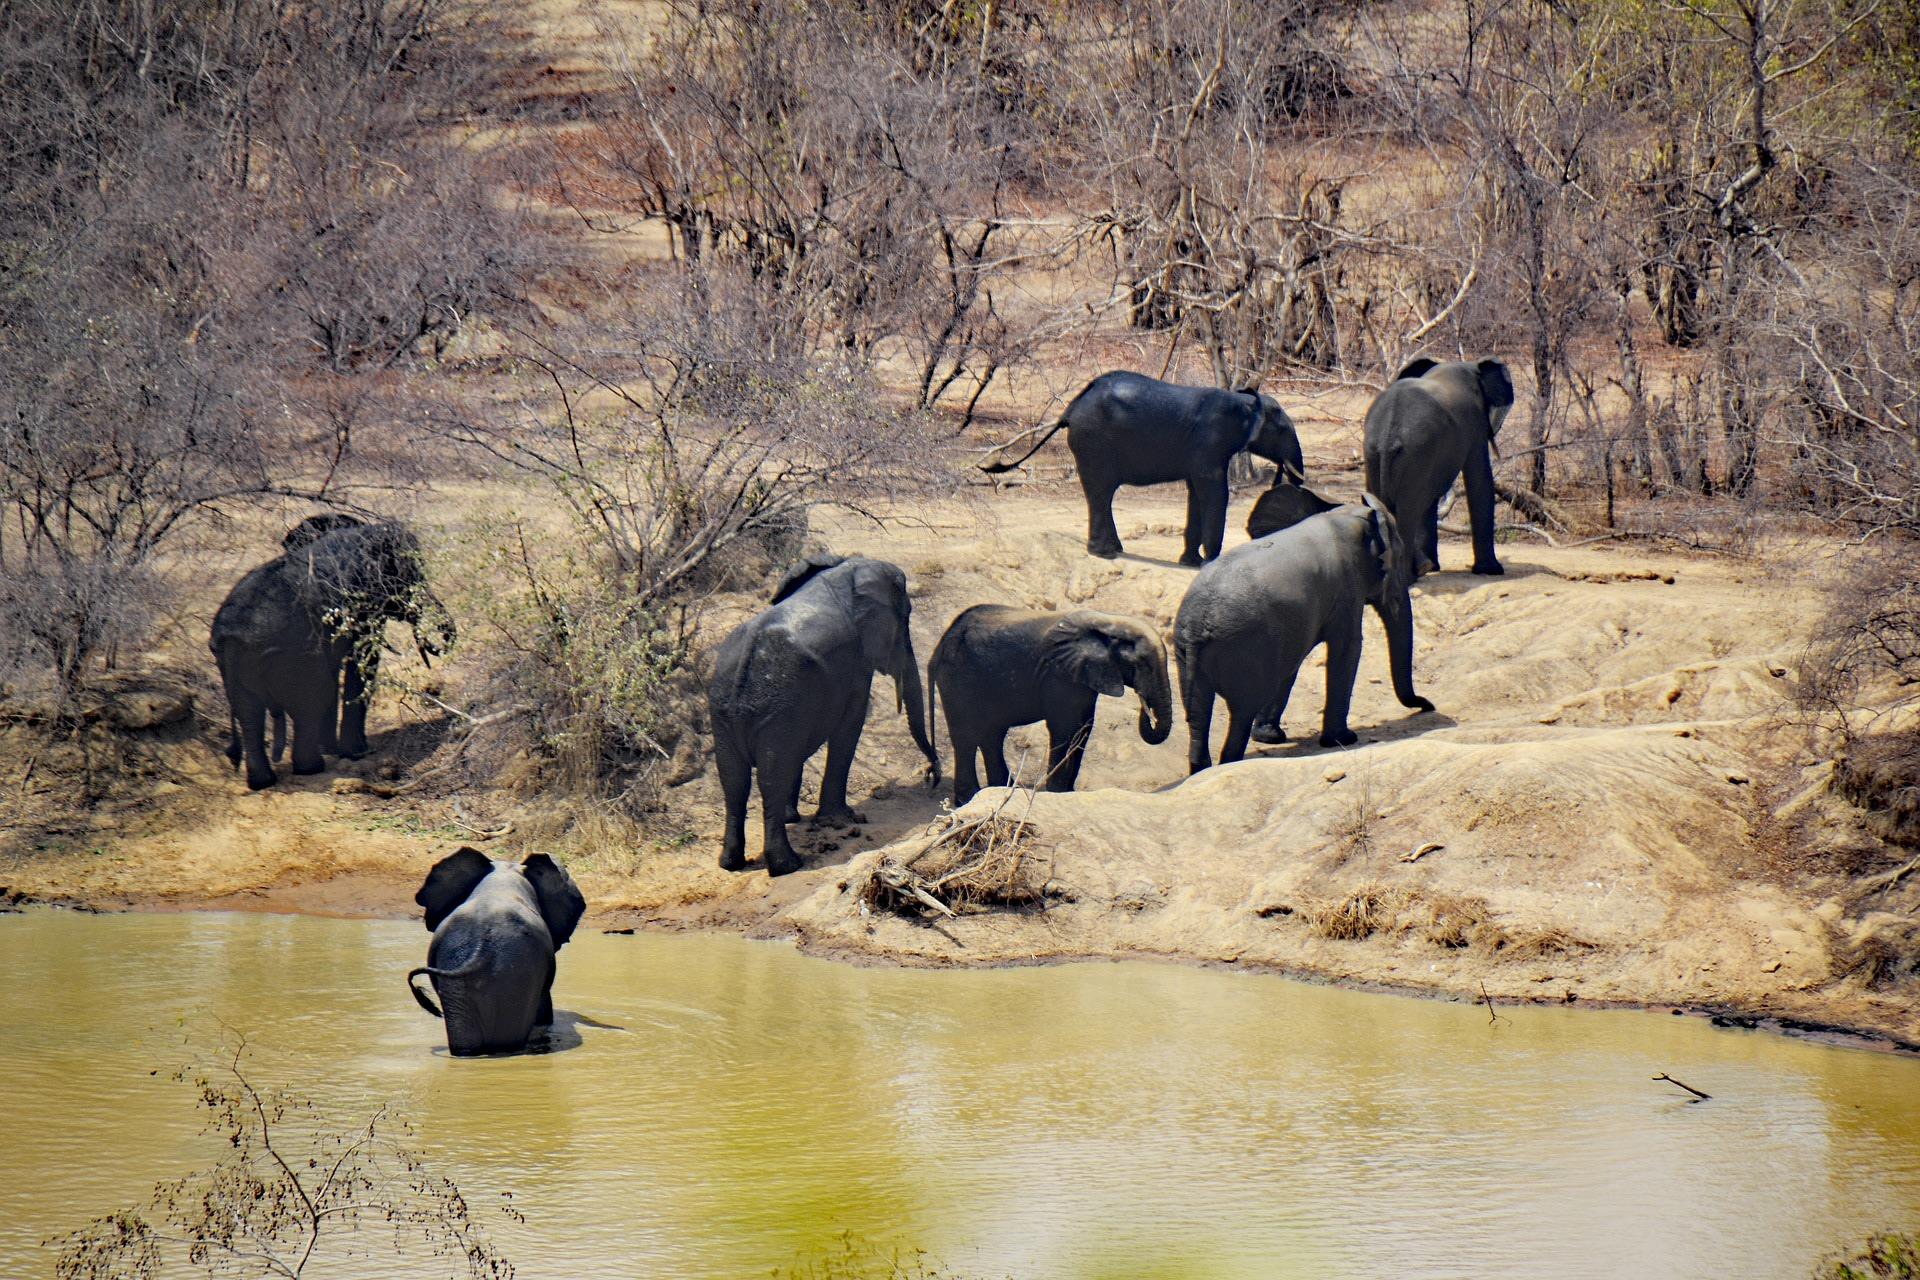 Wildlife at Pendjari National Park